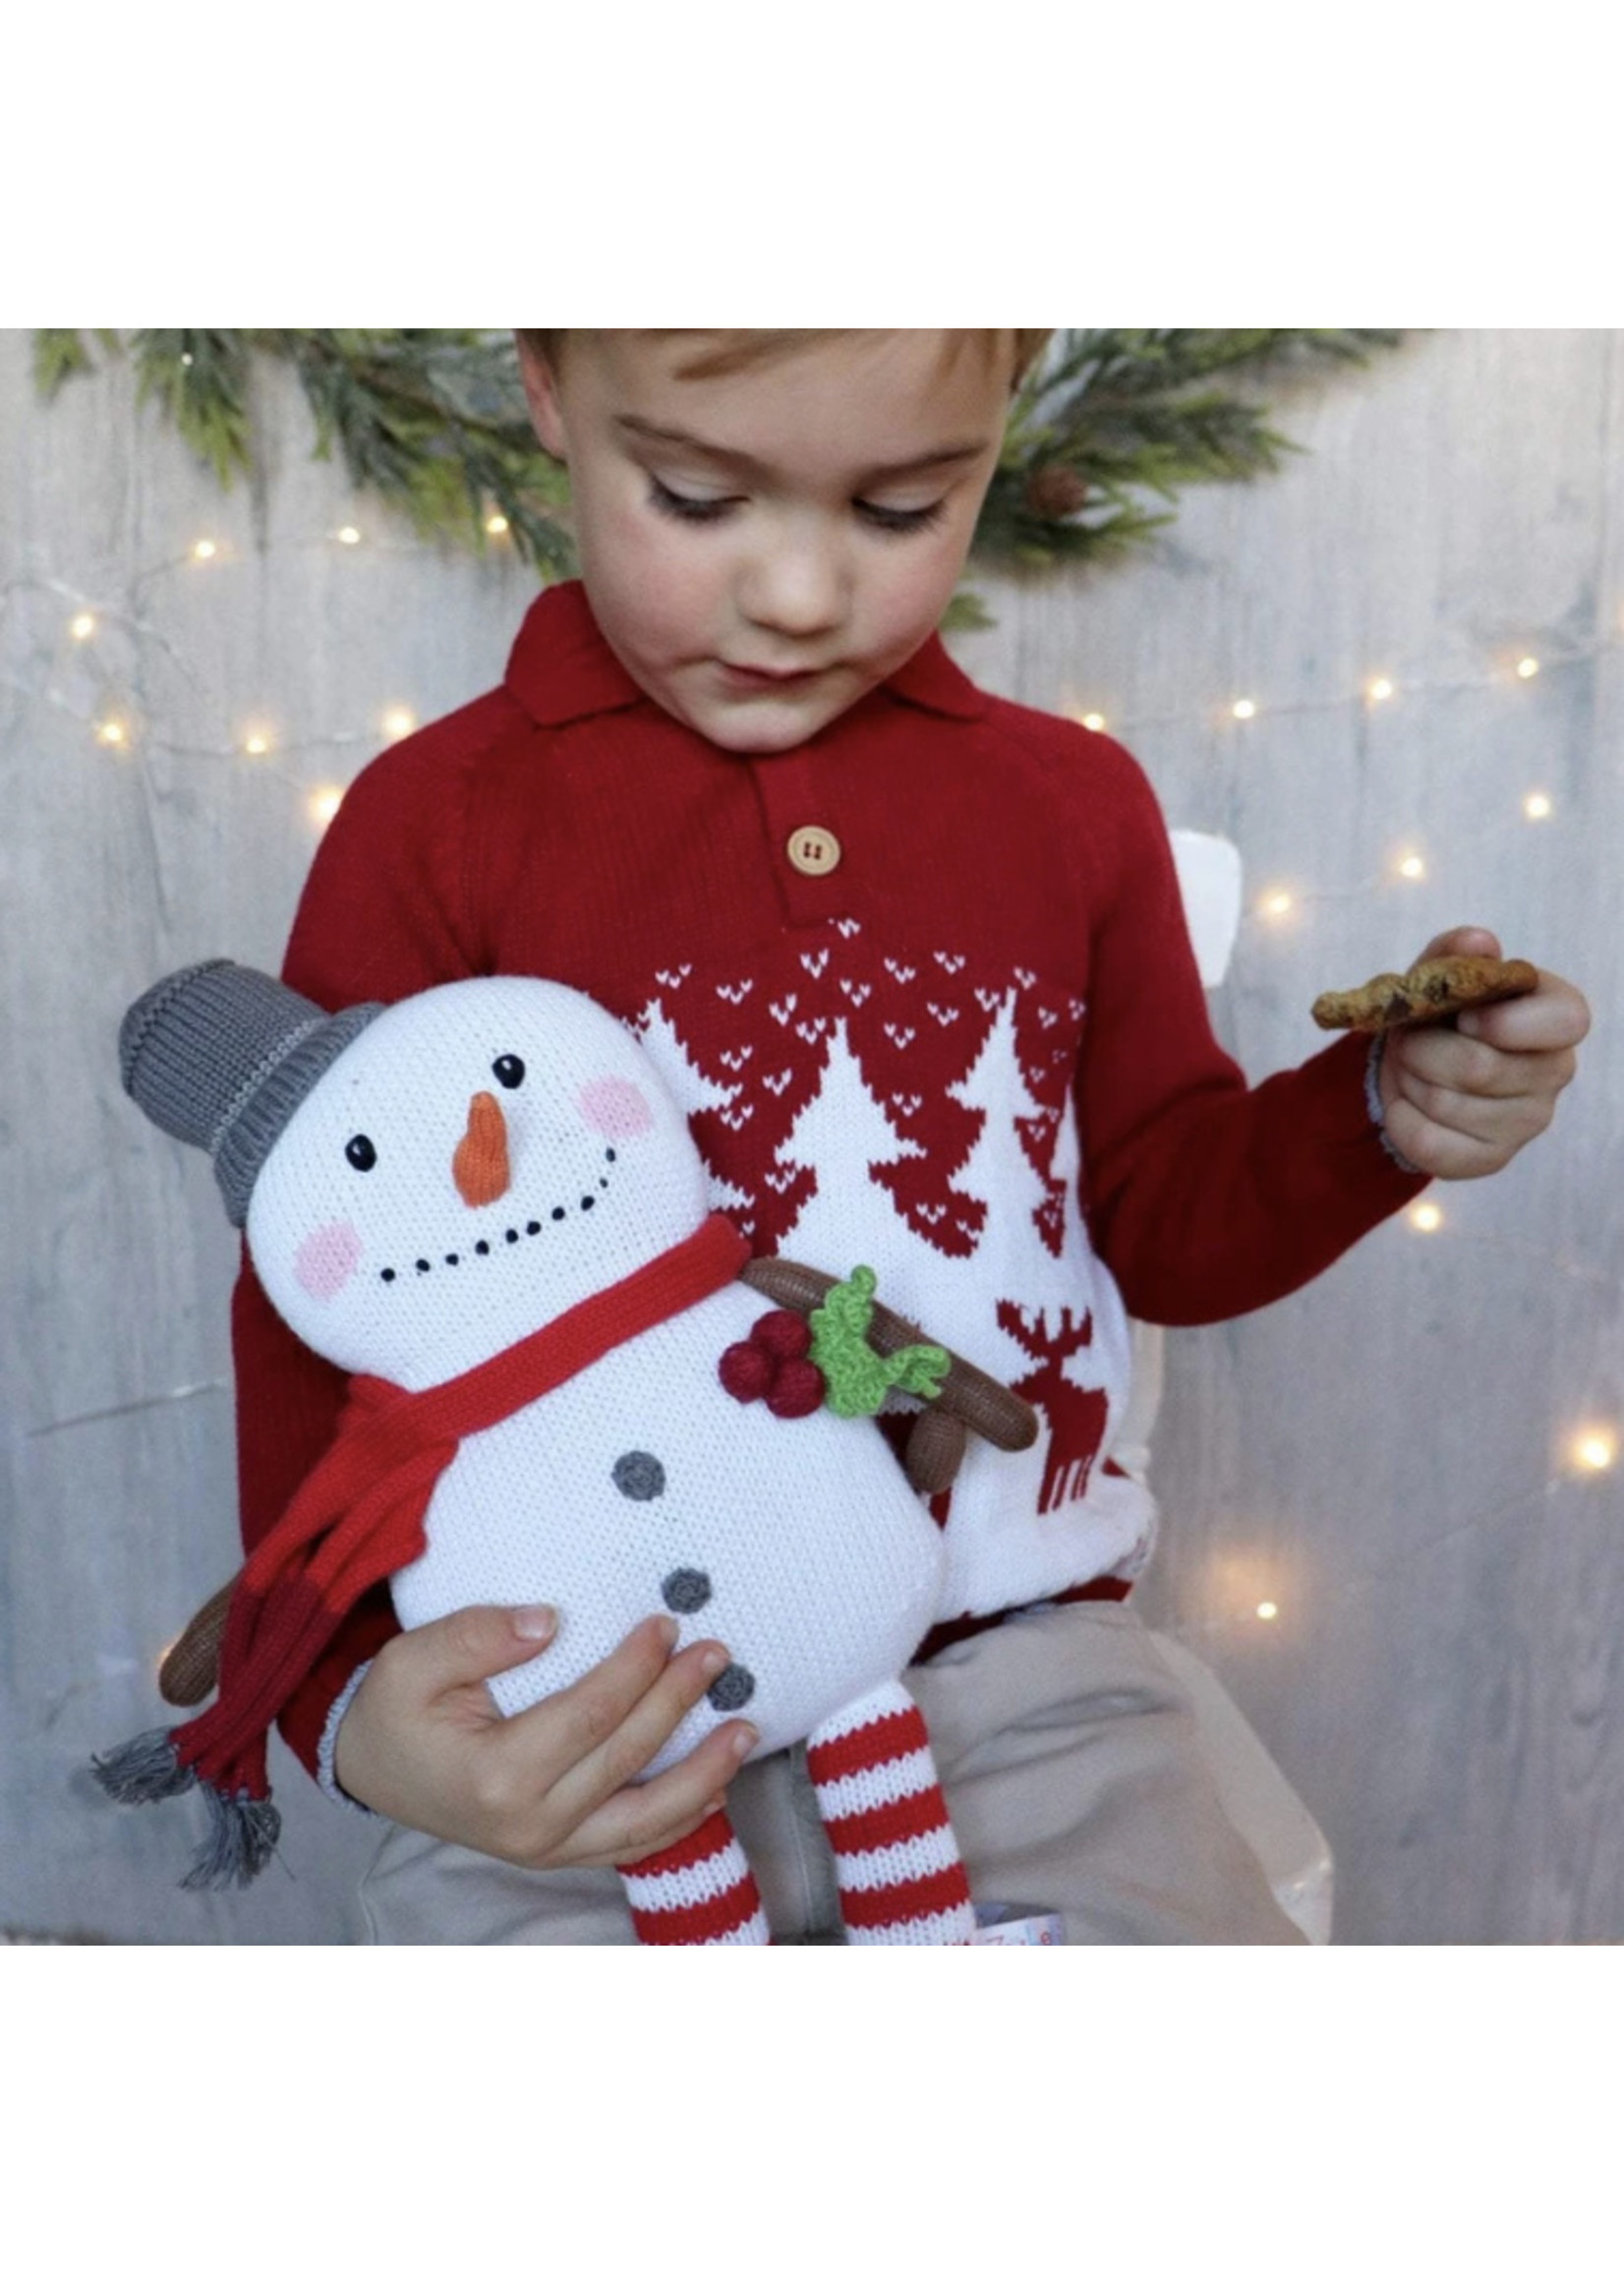 Zubels 14 inch Snowman